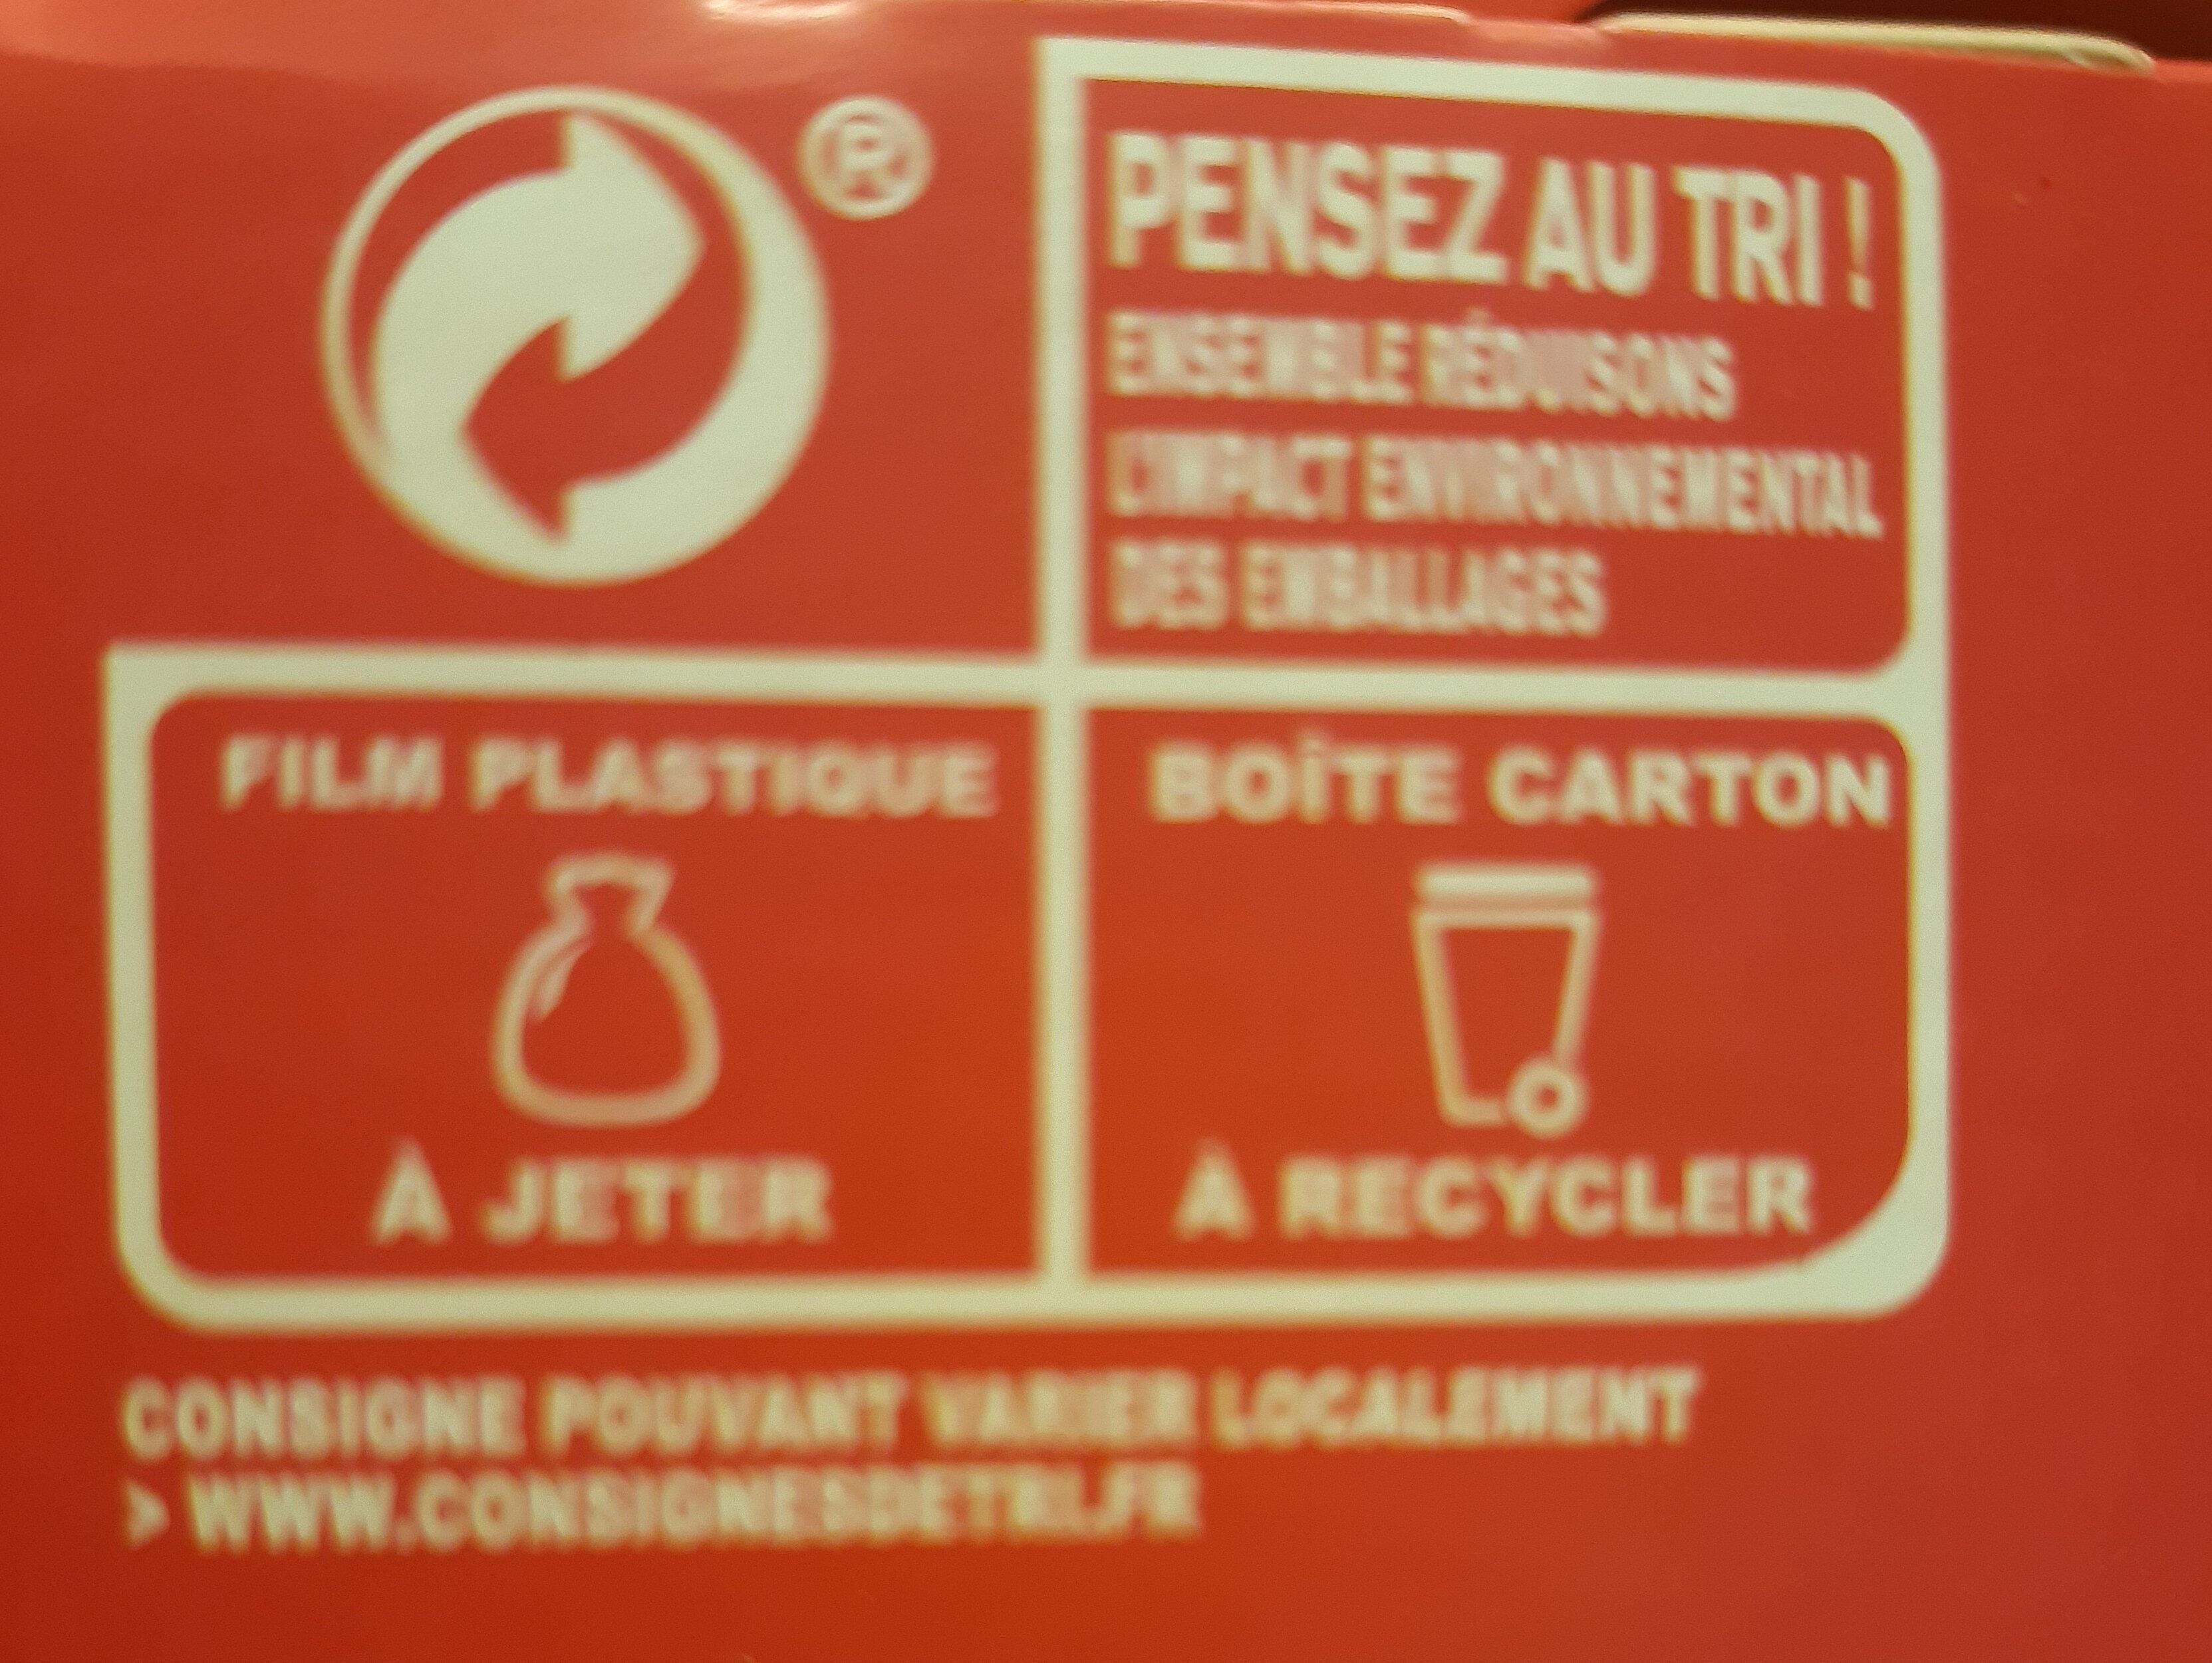 Elephant Bio Tisane Grenade Hibiscus 20 Sachets - Instruction de recyclage et/ou informations d'emballage - fr